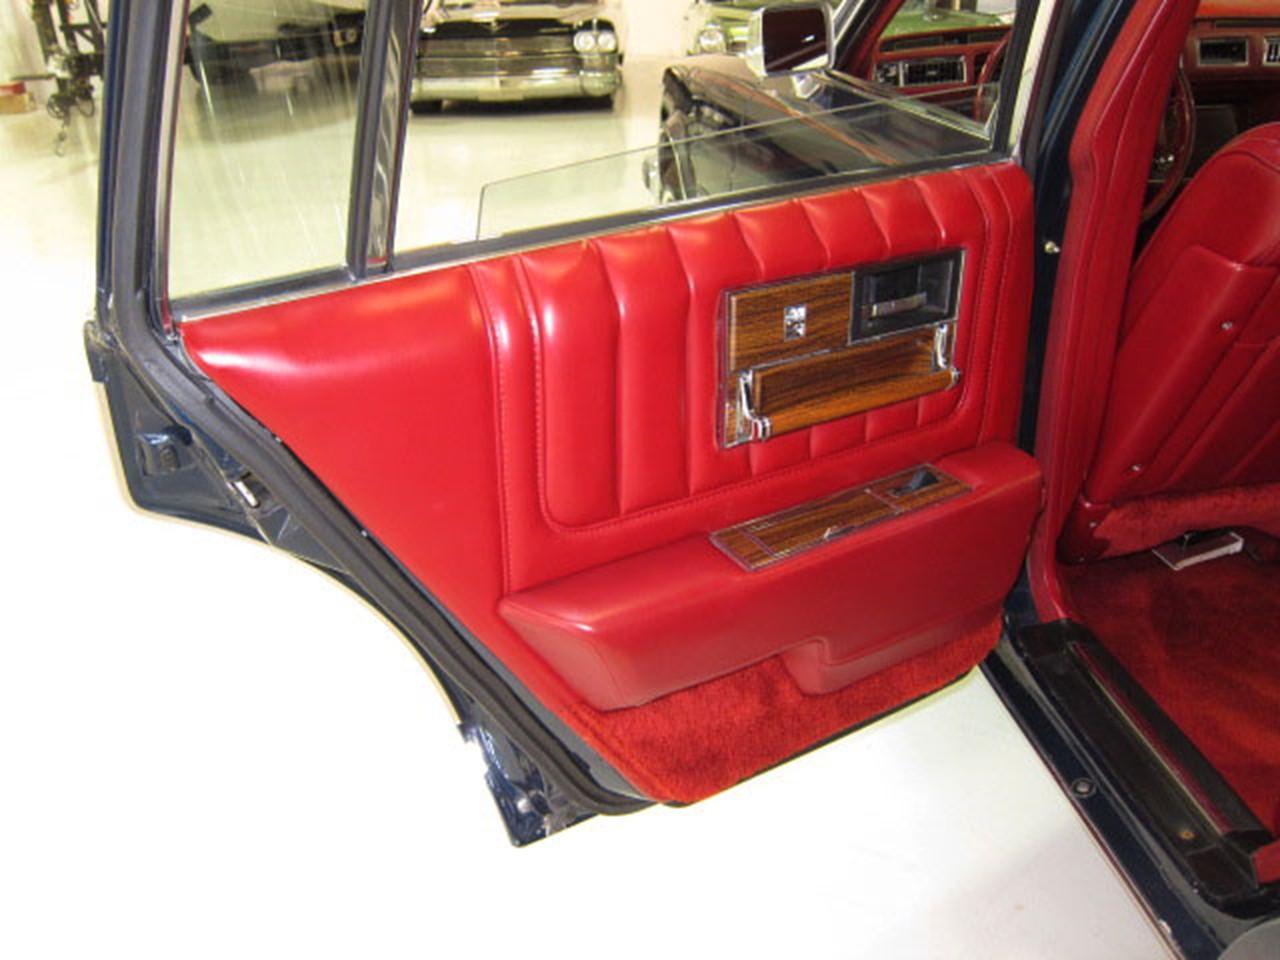 Fresh Metal 1978 Cadillac Seville Notoriousluxury Deville Hub Cap 23